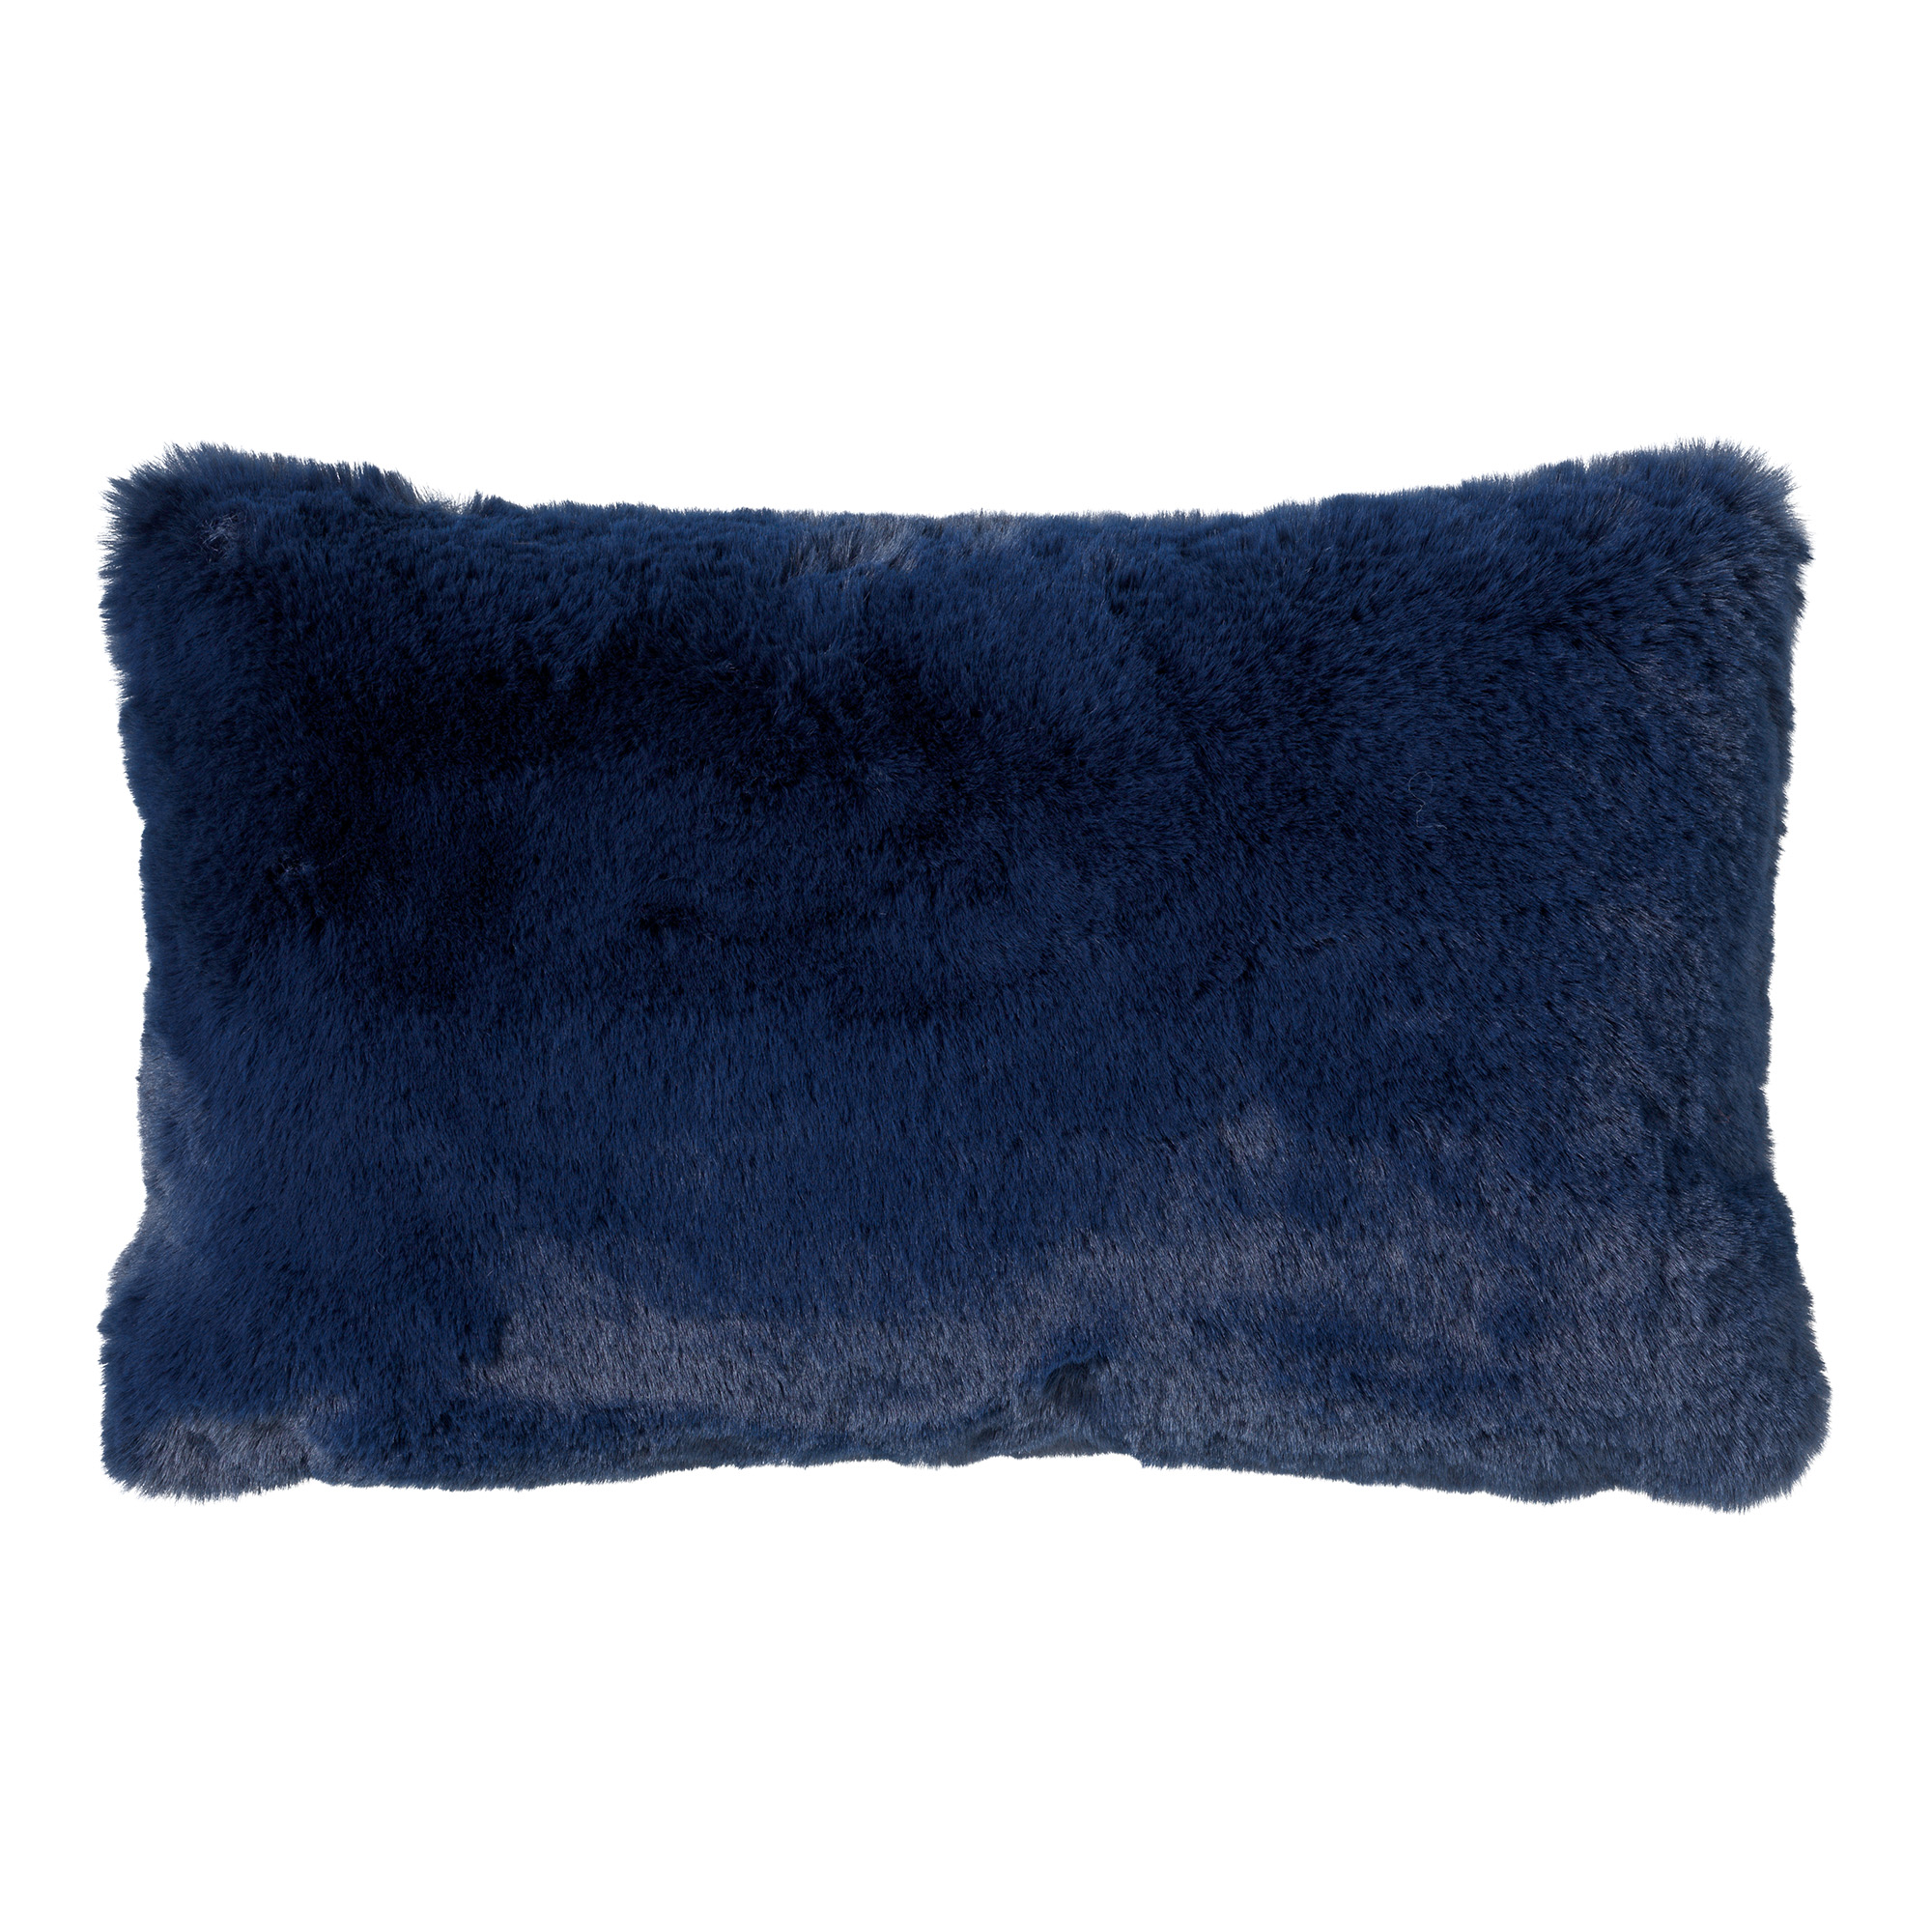 ZAYA - Sierkussen unikleur 30x50 cm Insignia Blue